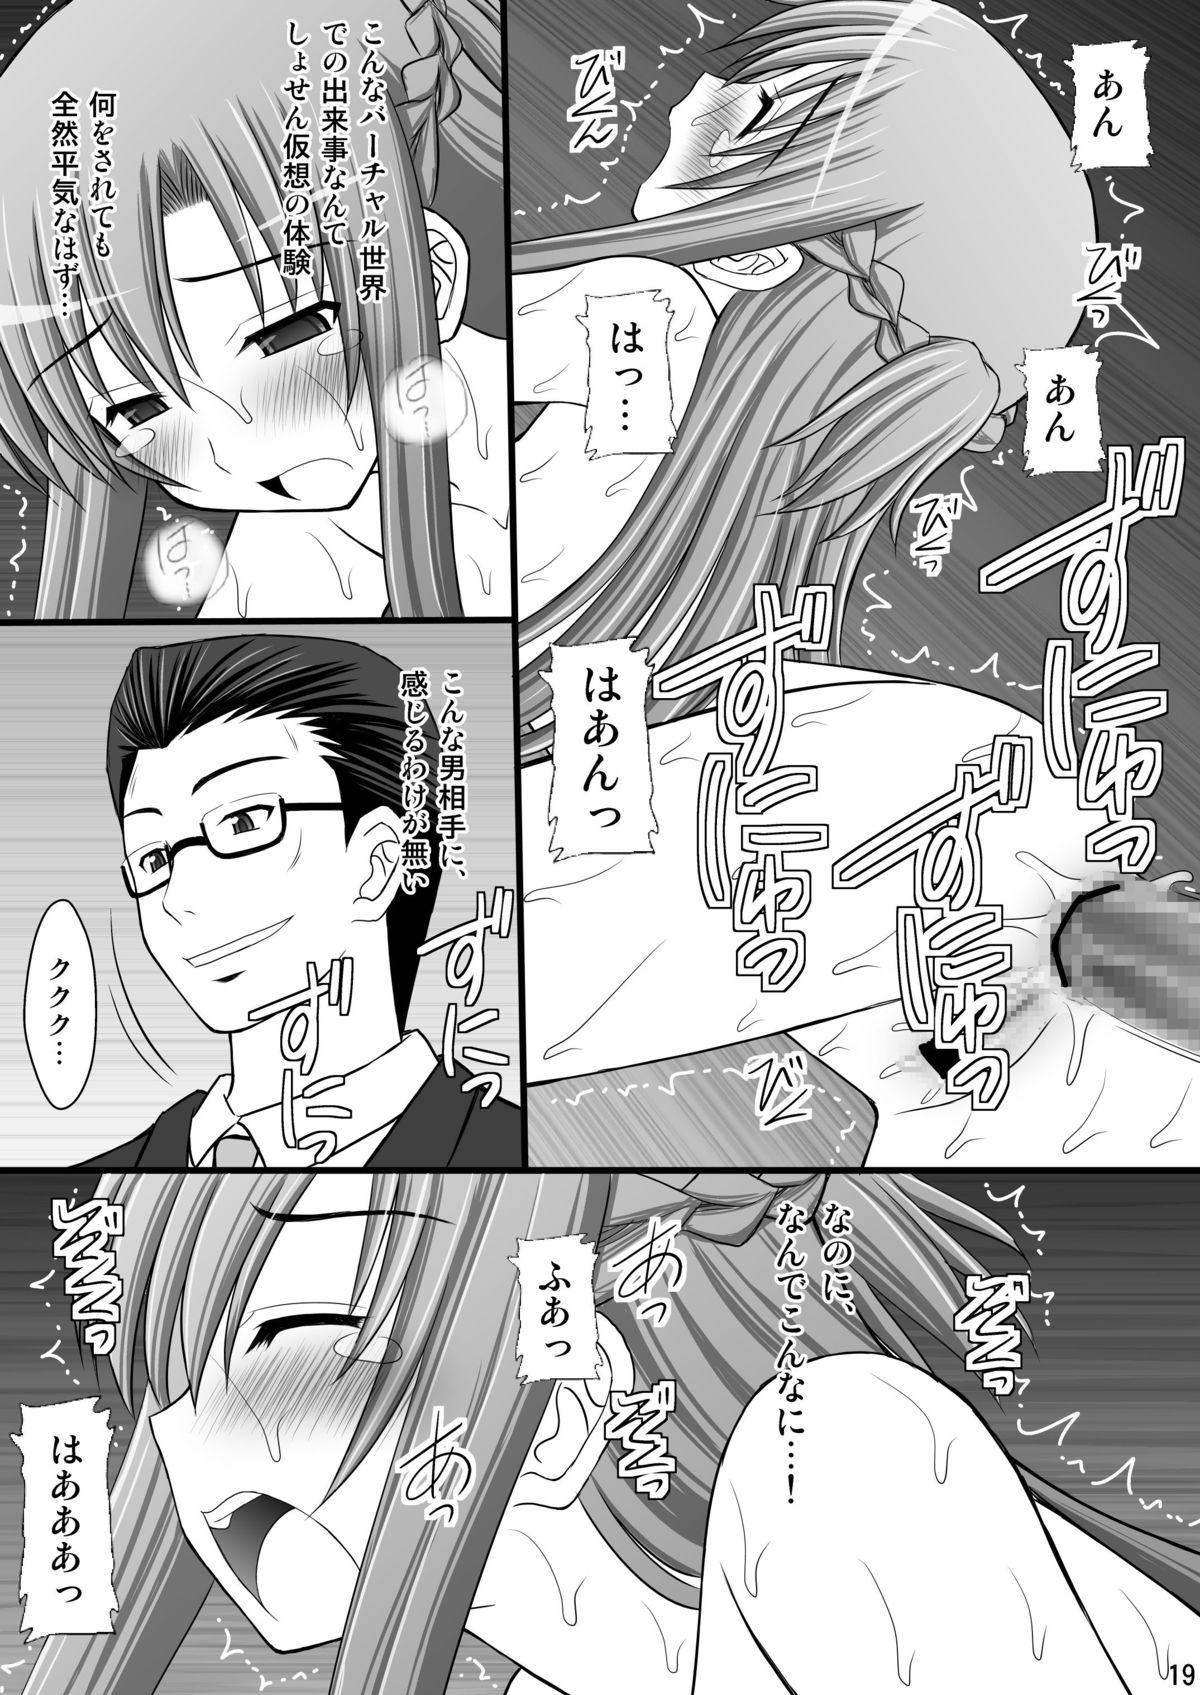 Toraware Hime I - System Master Nyaa Sakarae nee 17